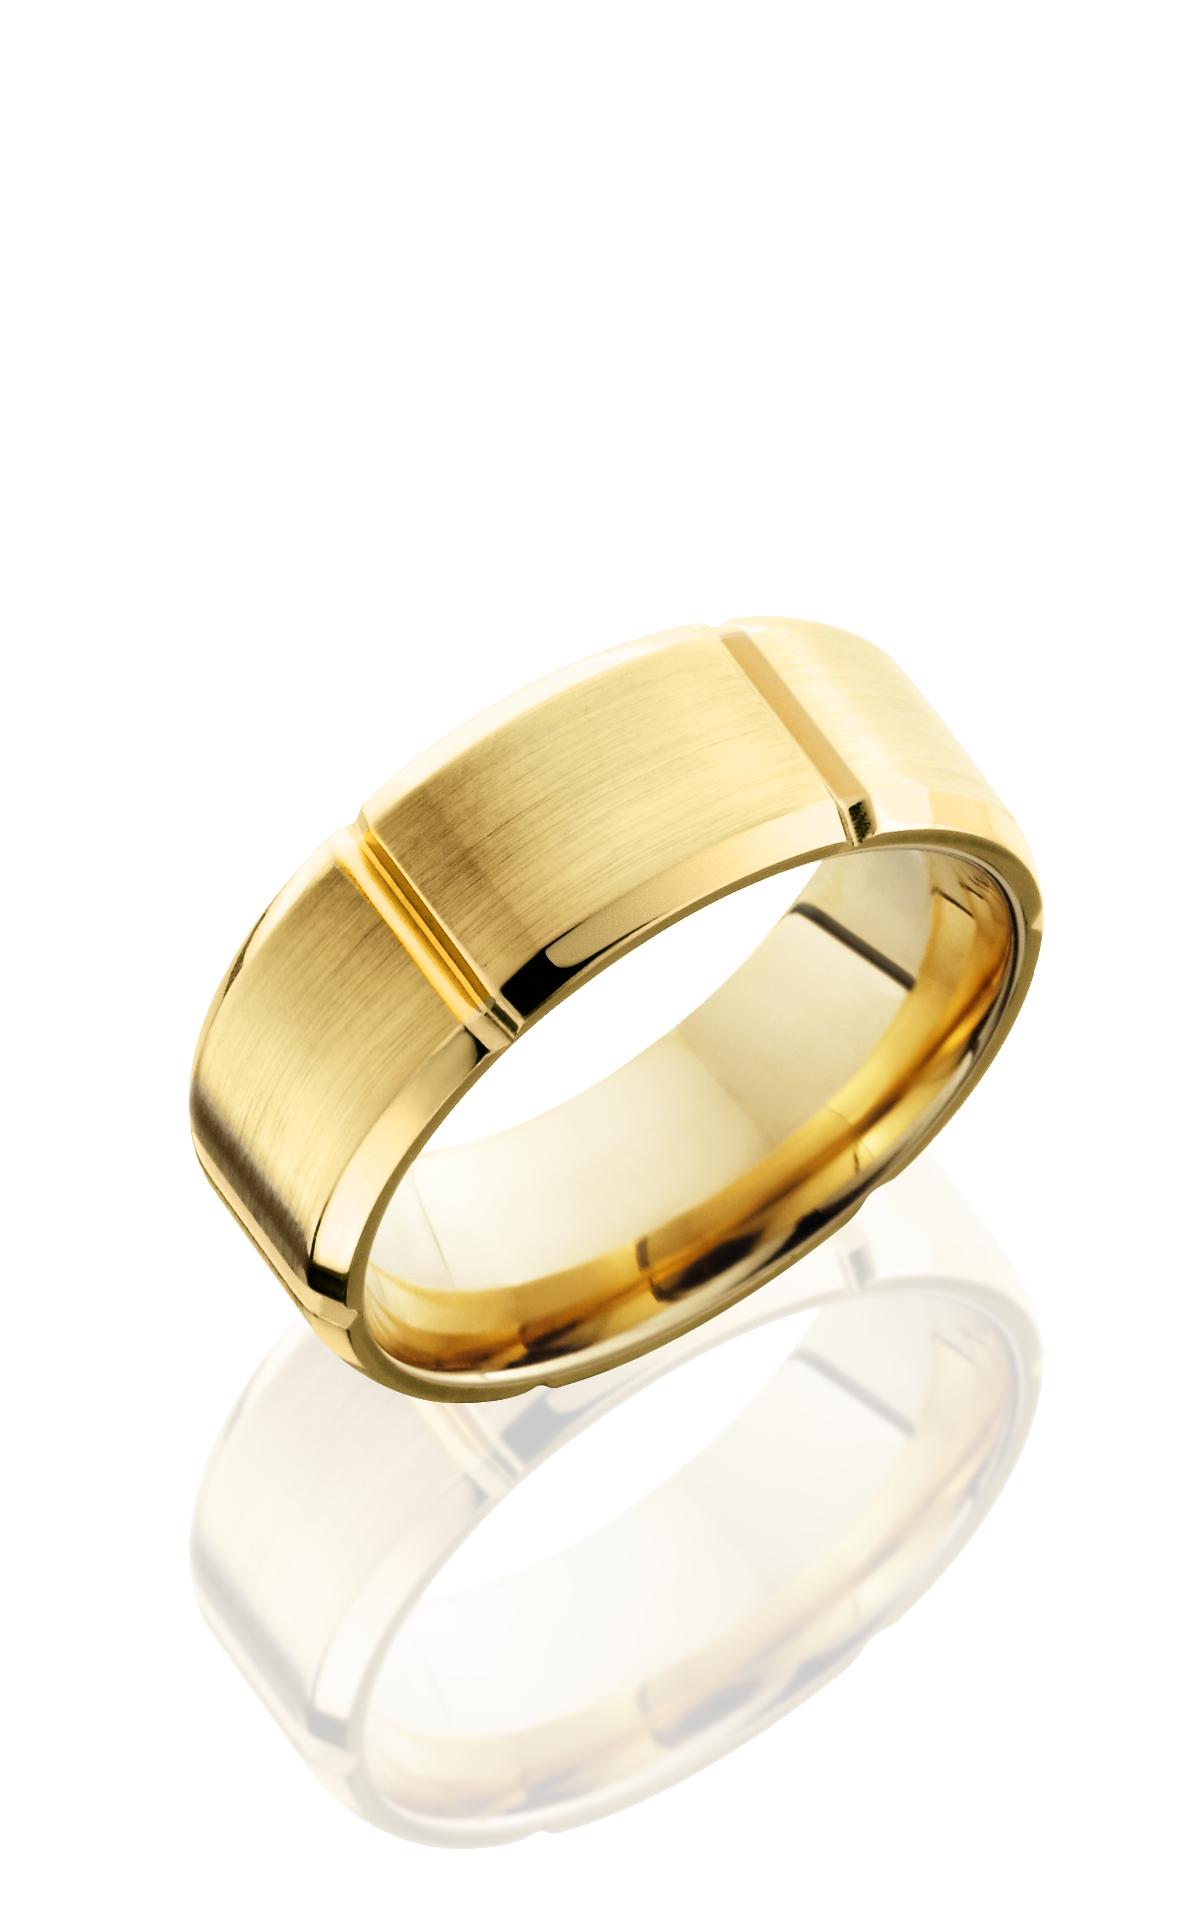 Lashbrook Precious Metals 90082 product image